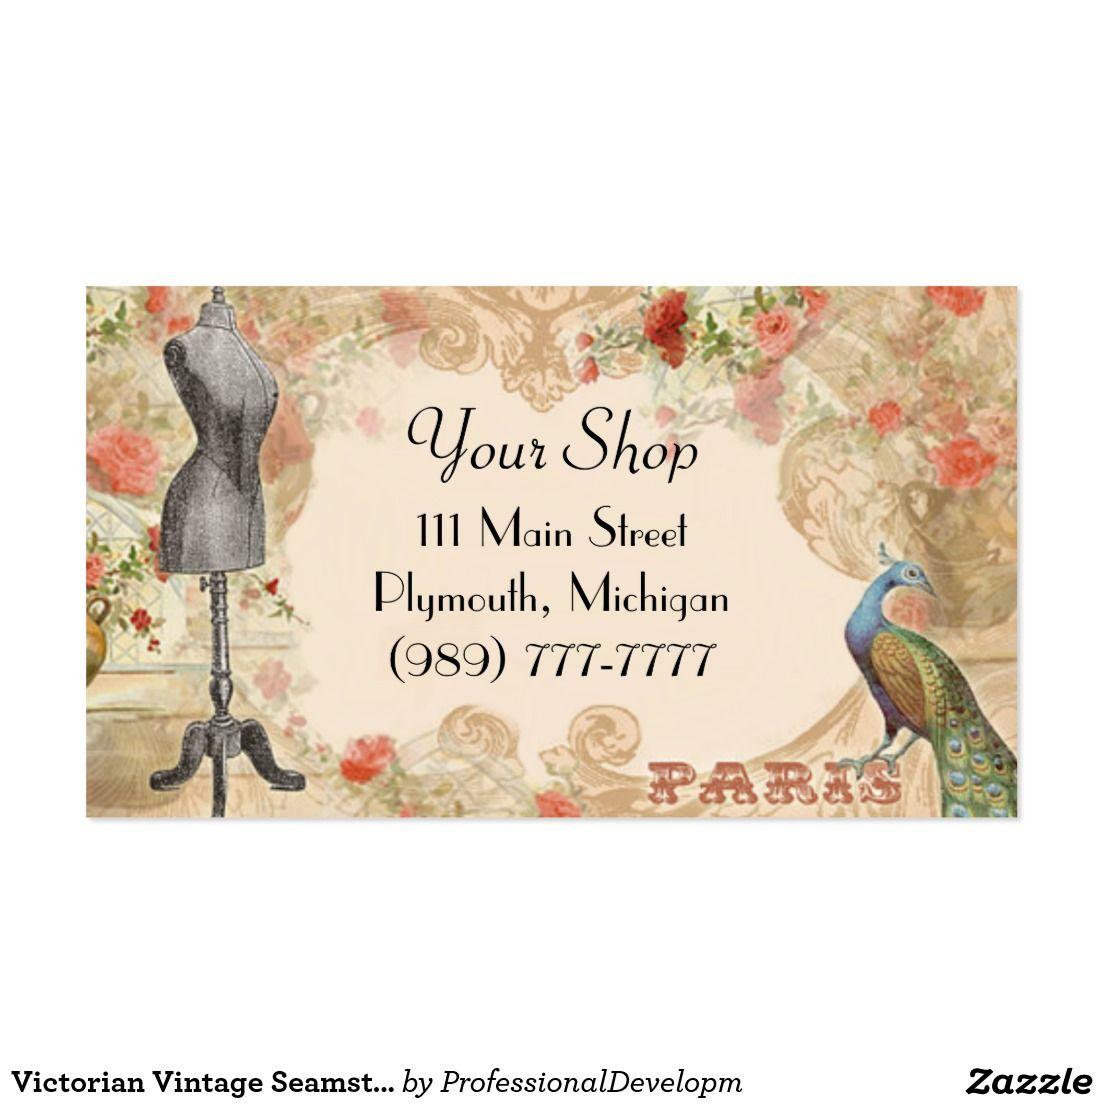 Victorian Vintage Seamstress Business Card | Vintage Postcards ...